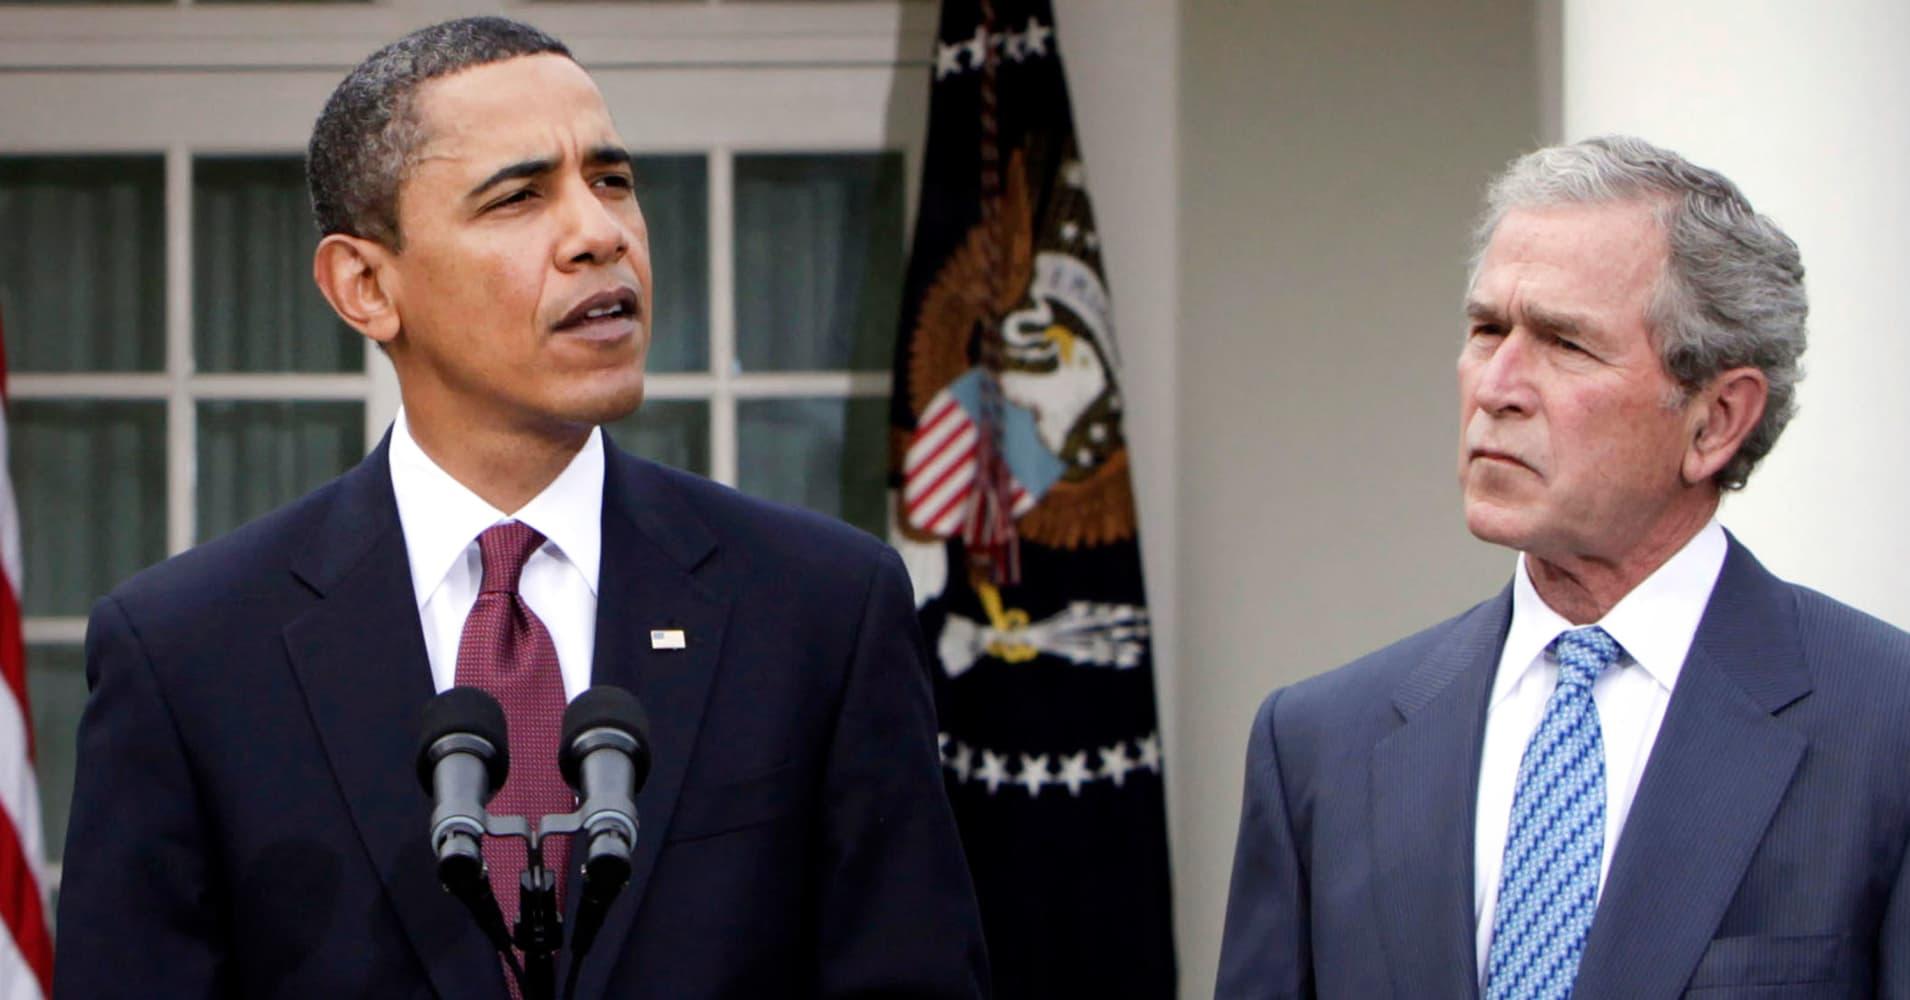 Obama and Bush also pressed NATO allies to spend more on defense